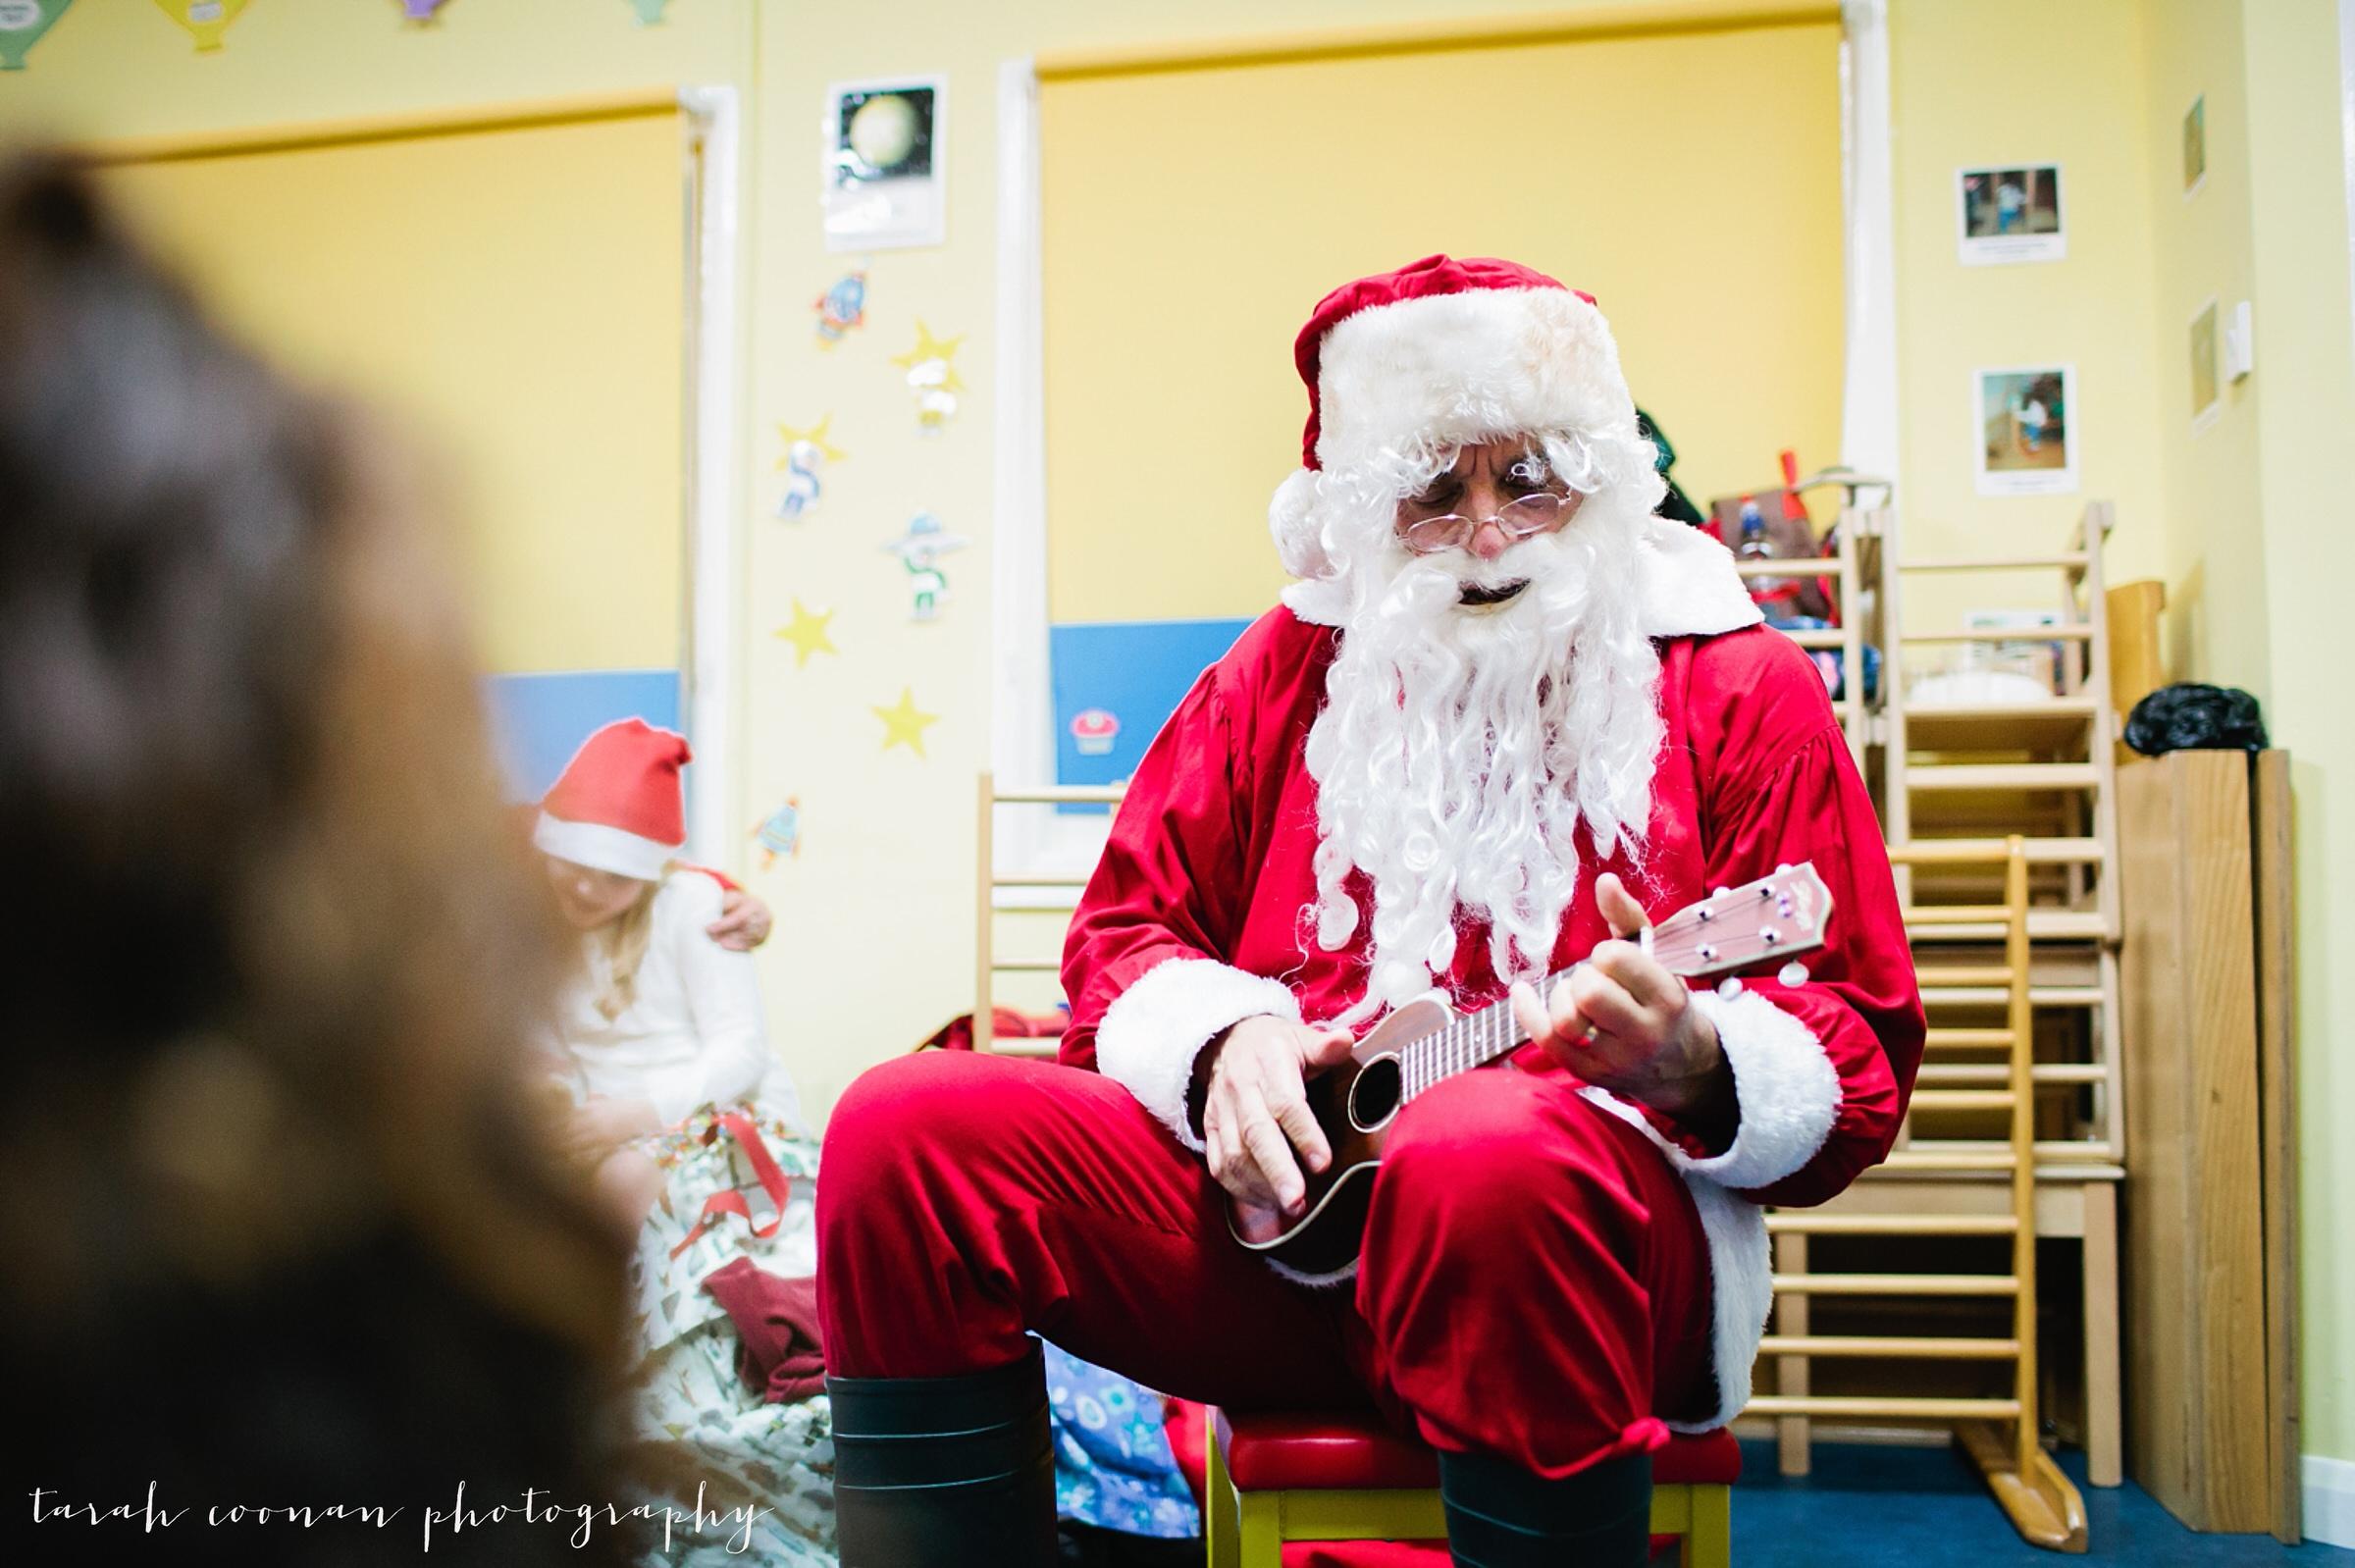 Whoopsadaisy Christmas Party